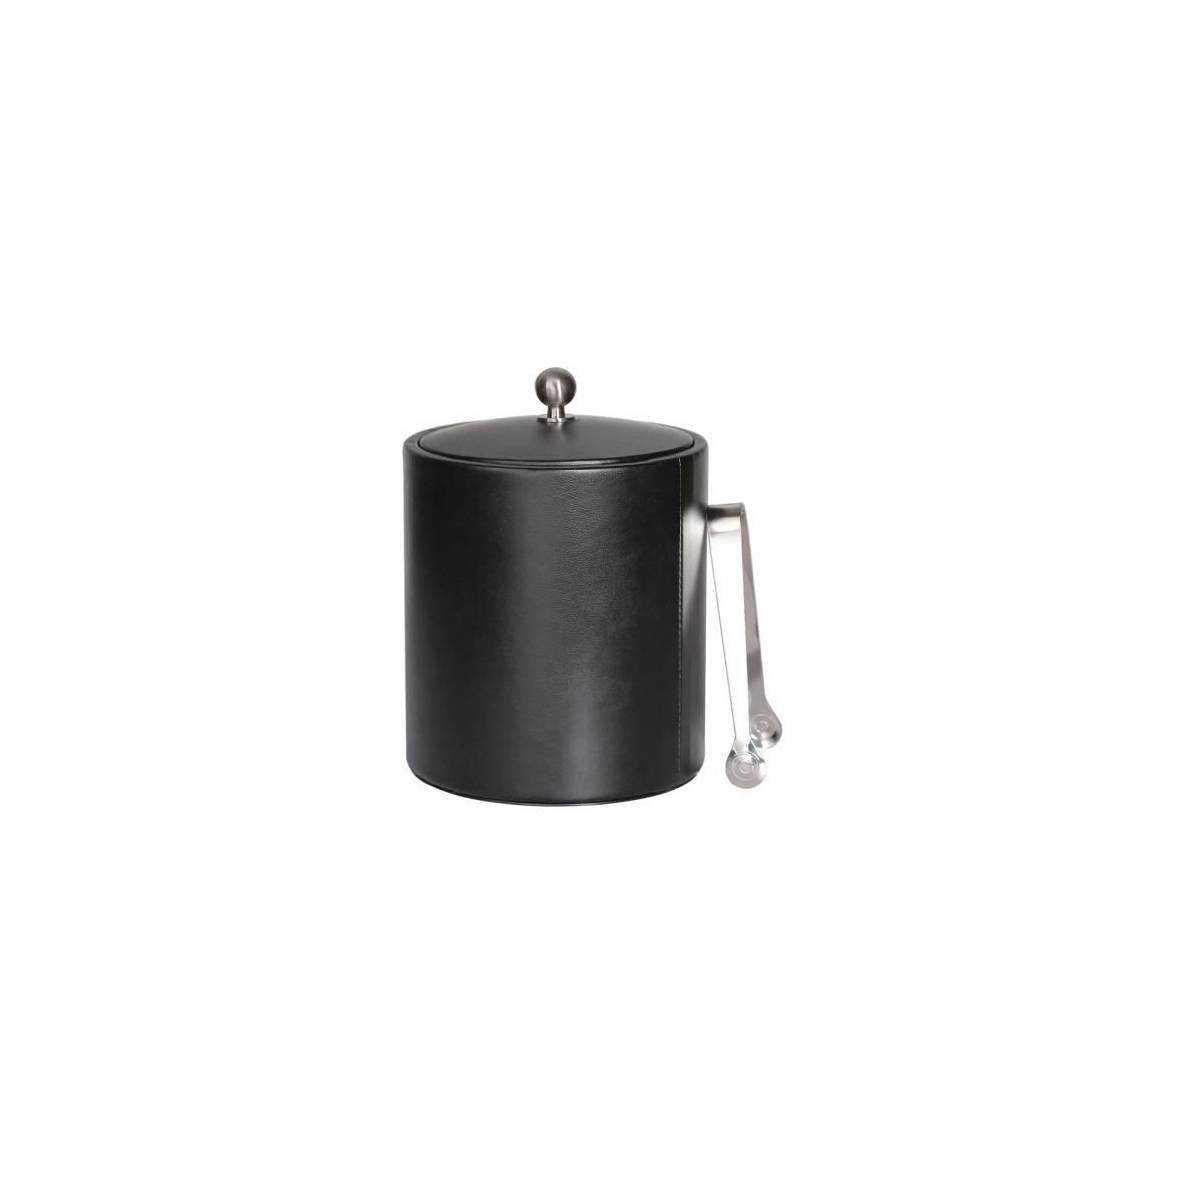 Ведро для льда 1л (черное) 8991028 BK JVD